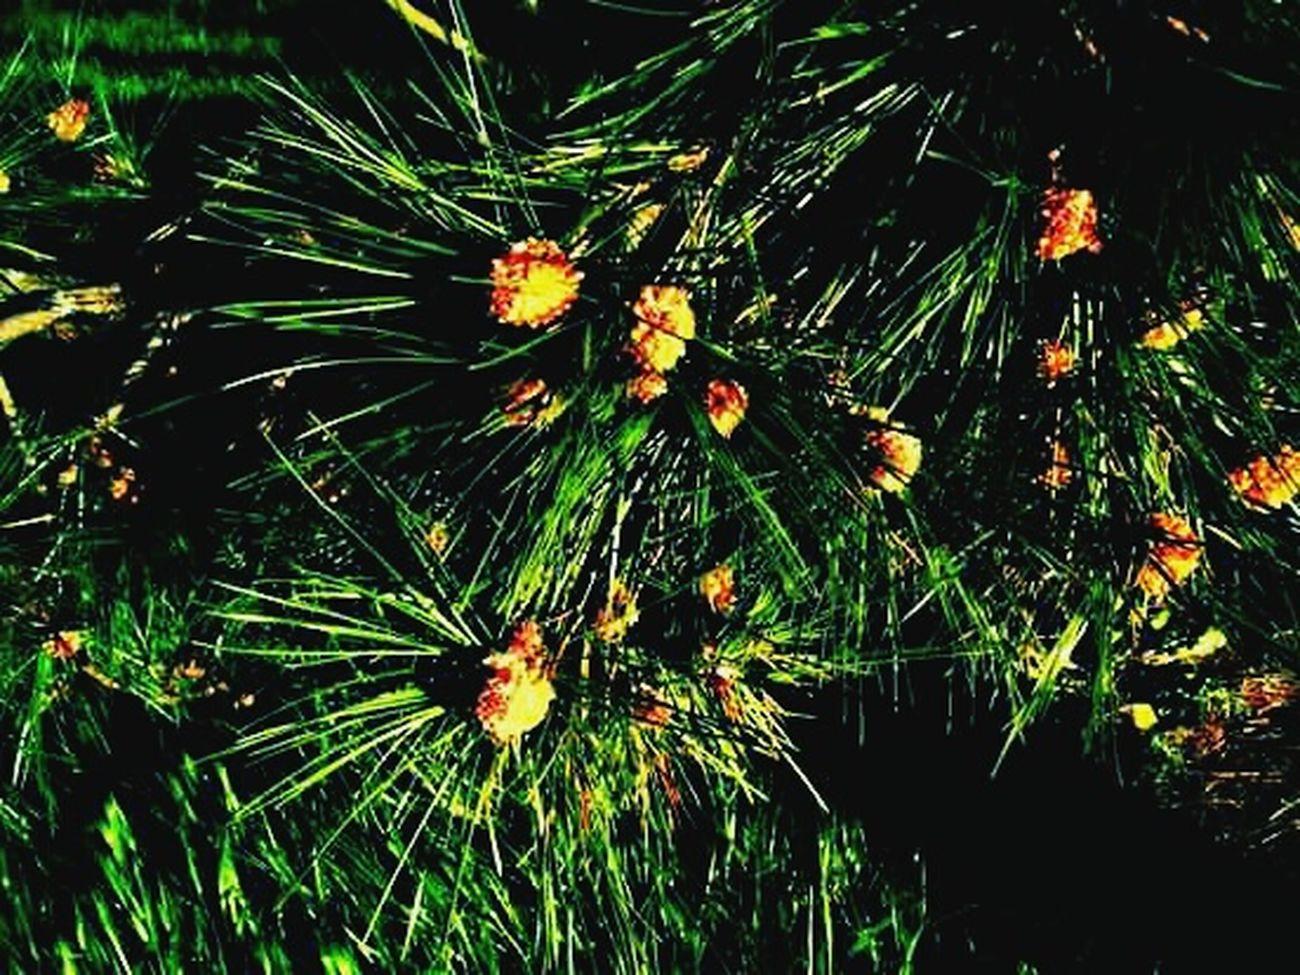 Drzewko Beautiful Nature Artistic Photo Summer Tree Passion